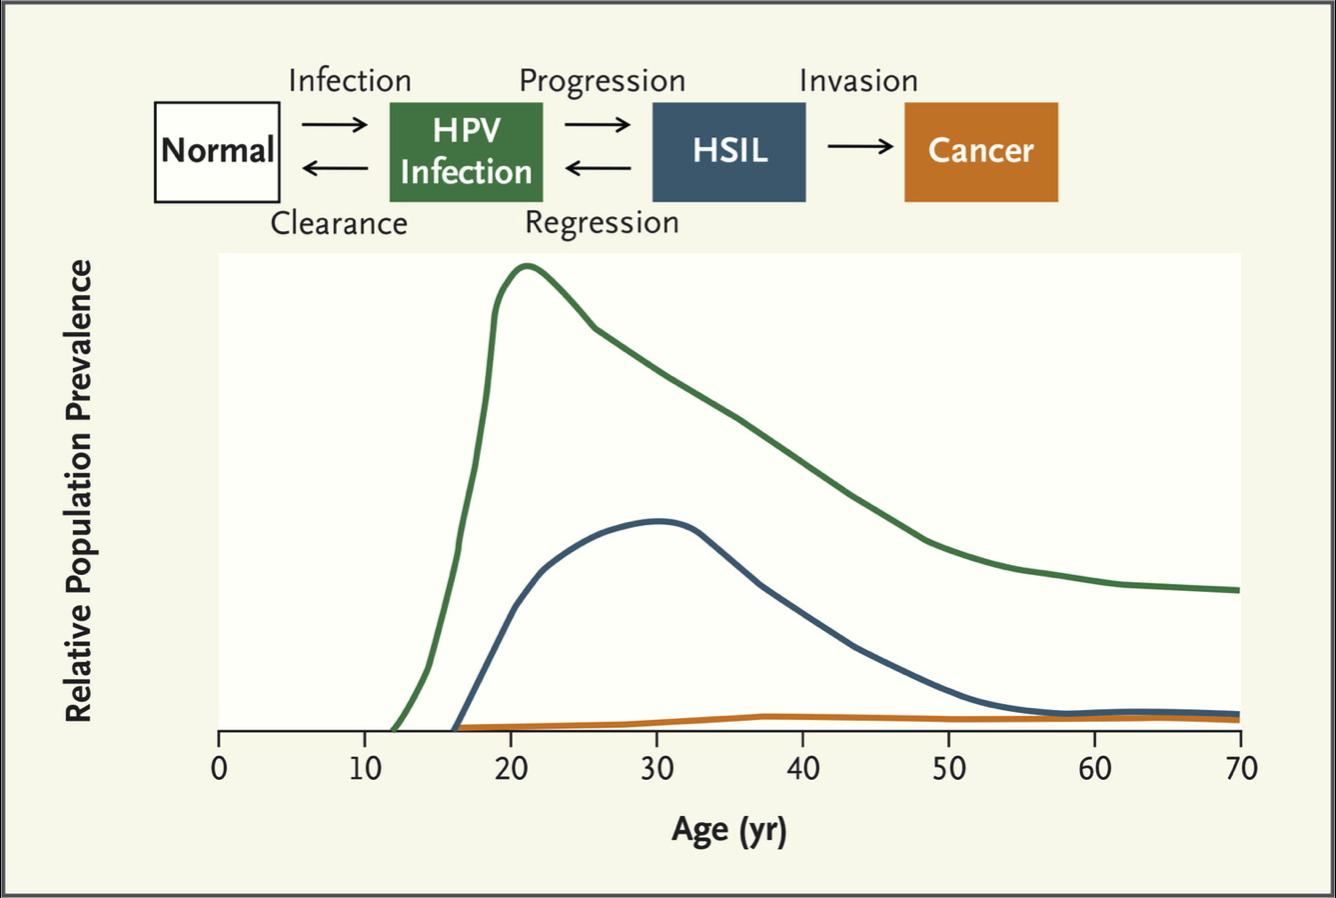 hpv 16 virus manner papilloma cancer breast